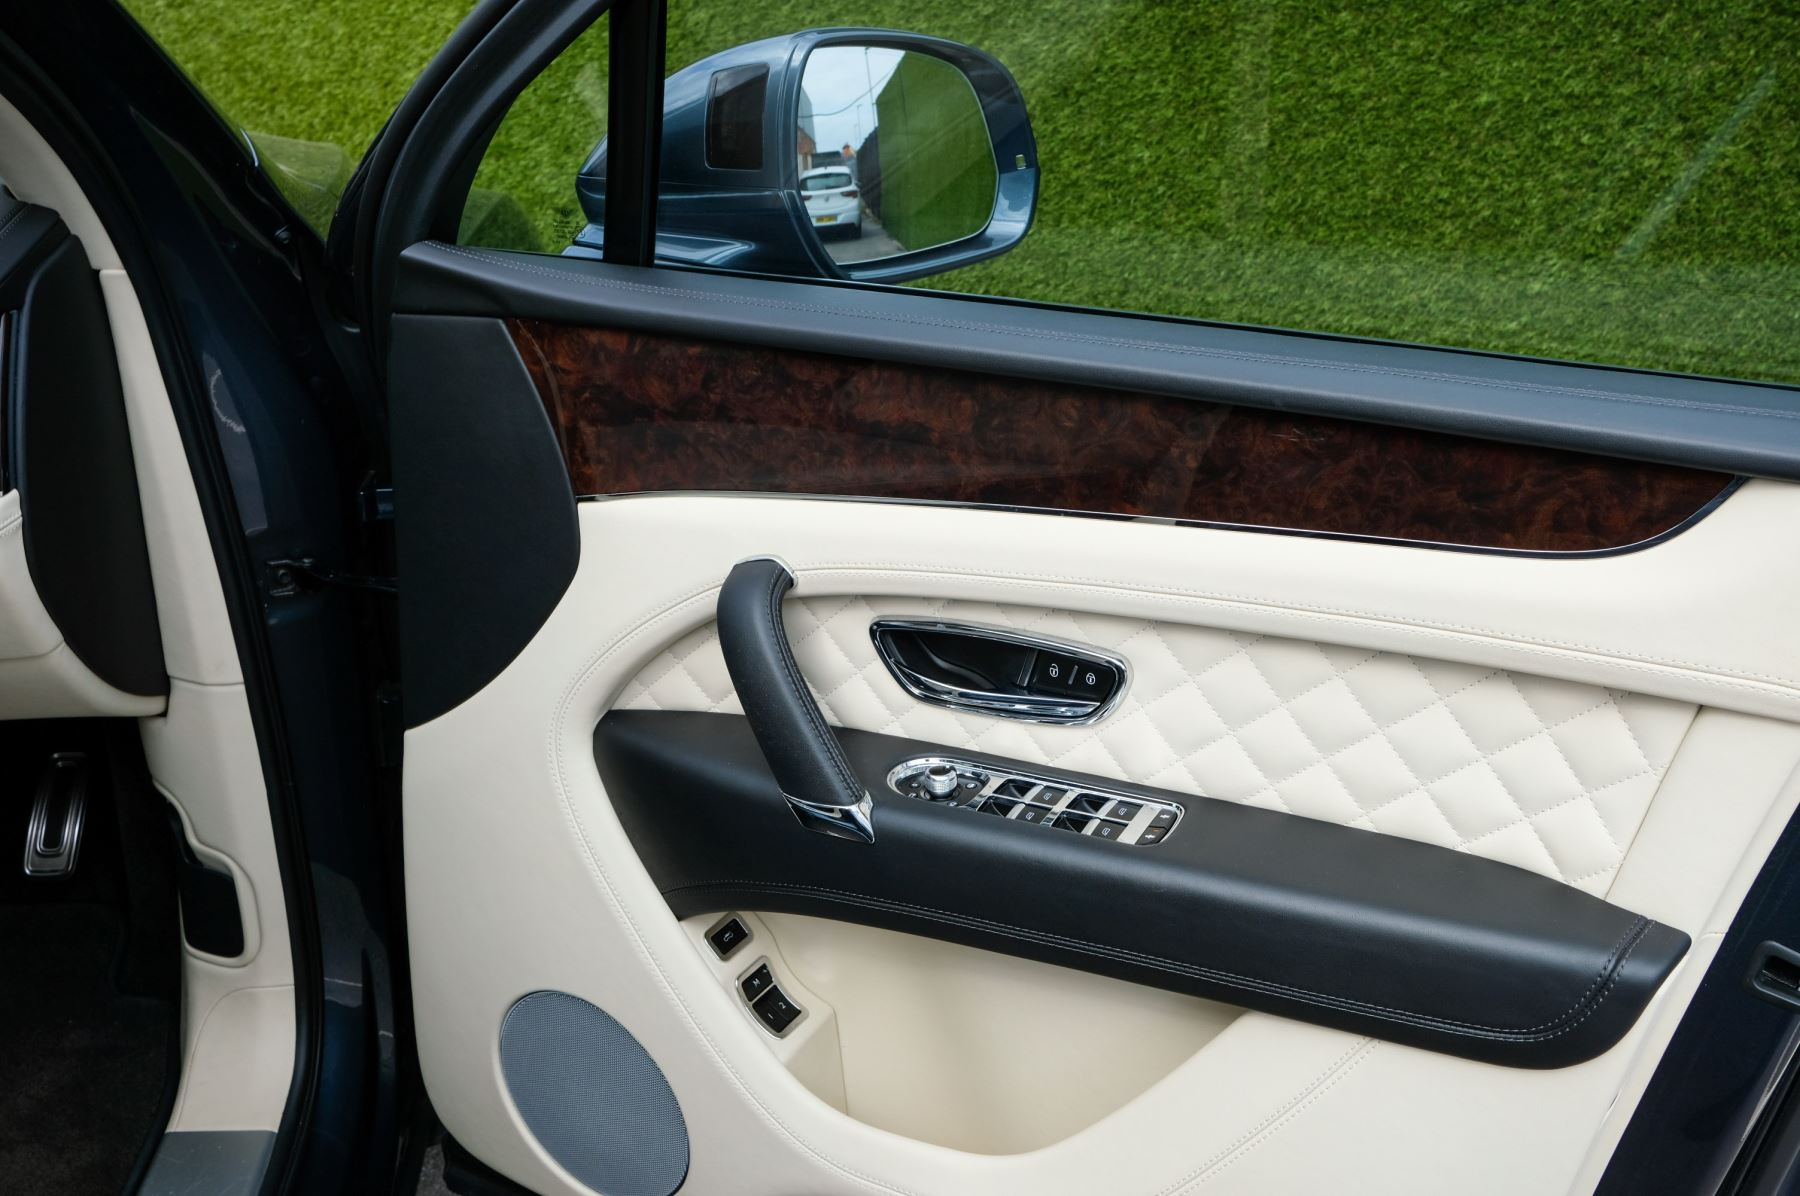 Bentley Bentayga 4.0 V8 5dr - Mulliner Driving Specification - City & Tour Specification image 18